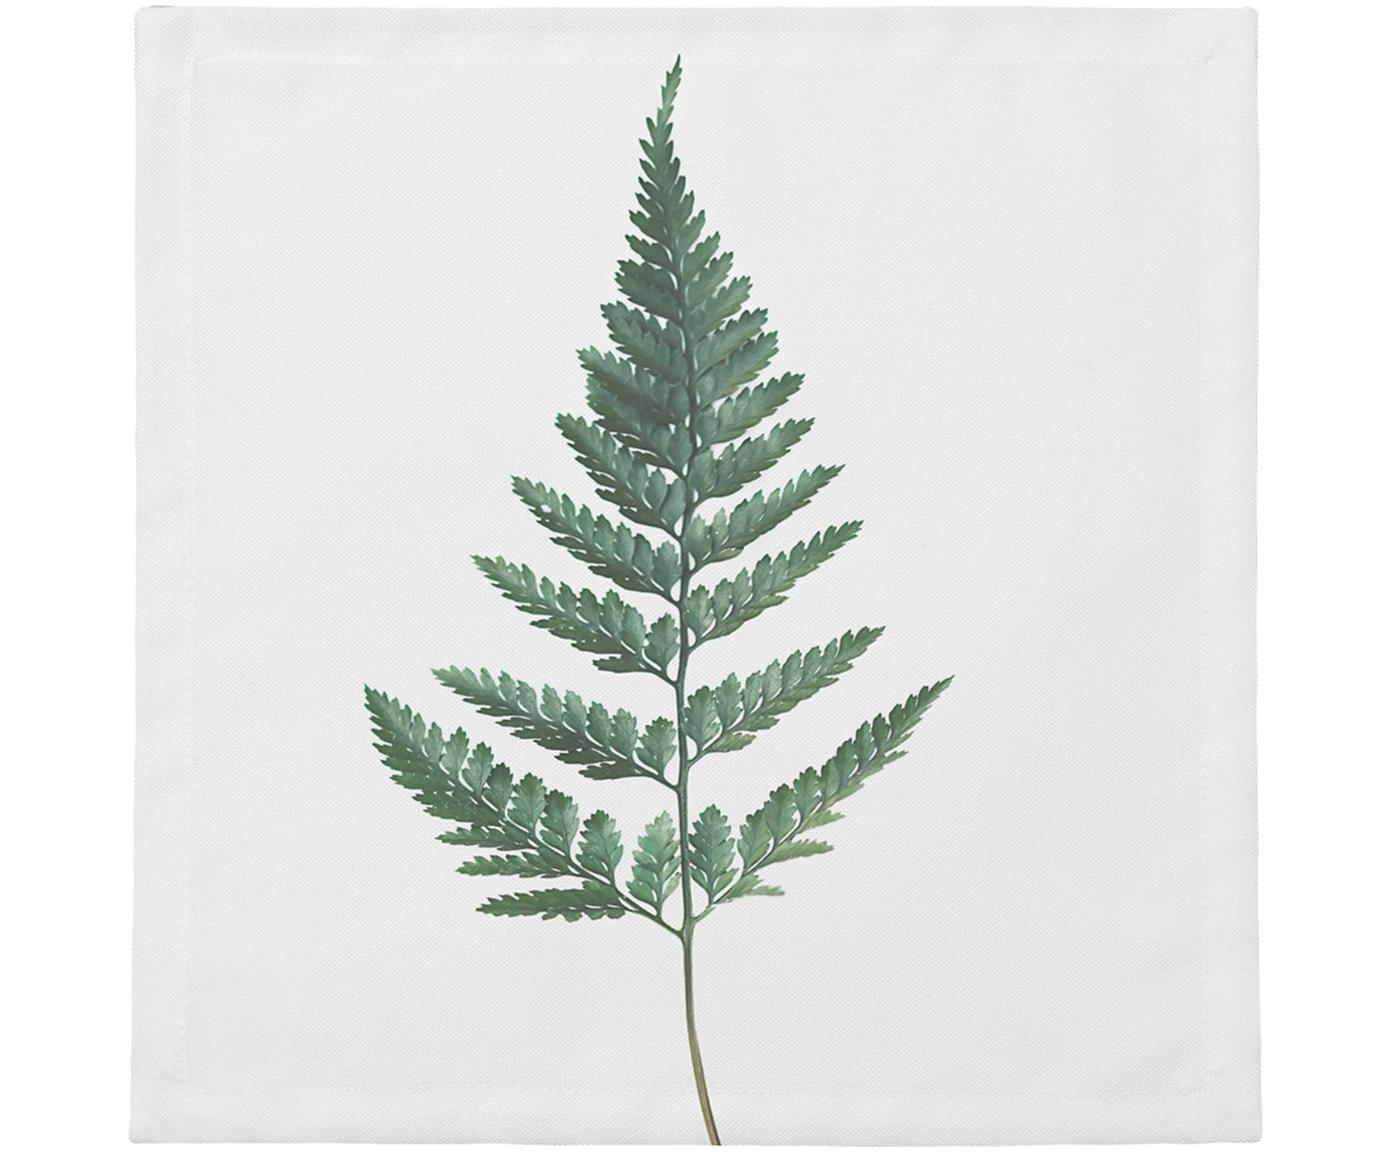 Stoffen servetten Fern, 4 stuks, Katoen, Wit, groen, 40 x 40 cm